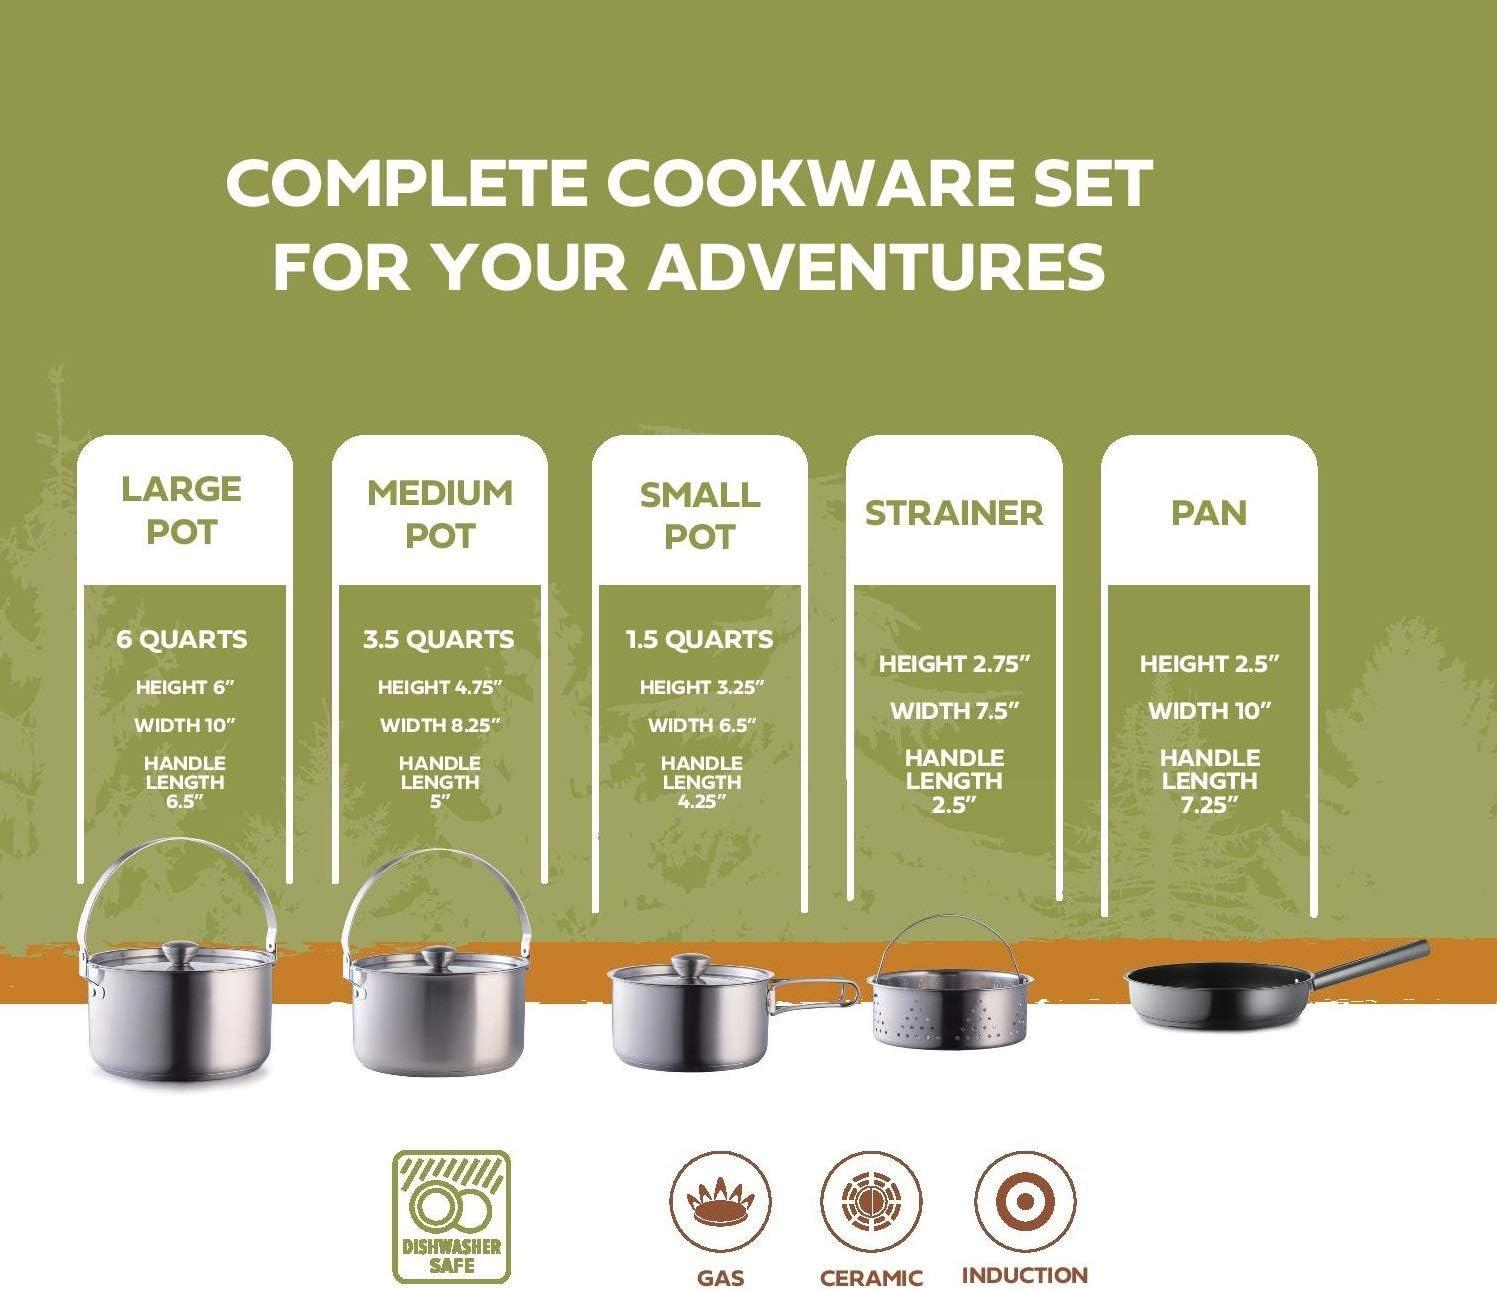 Dibiao Camping Cookware Set Portable Outdoor Cooking Set Camping Hiking Cookware Picnic Stockpot Pan Camping Pots and Pans Set